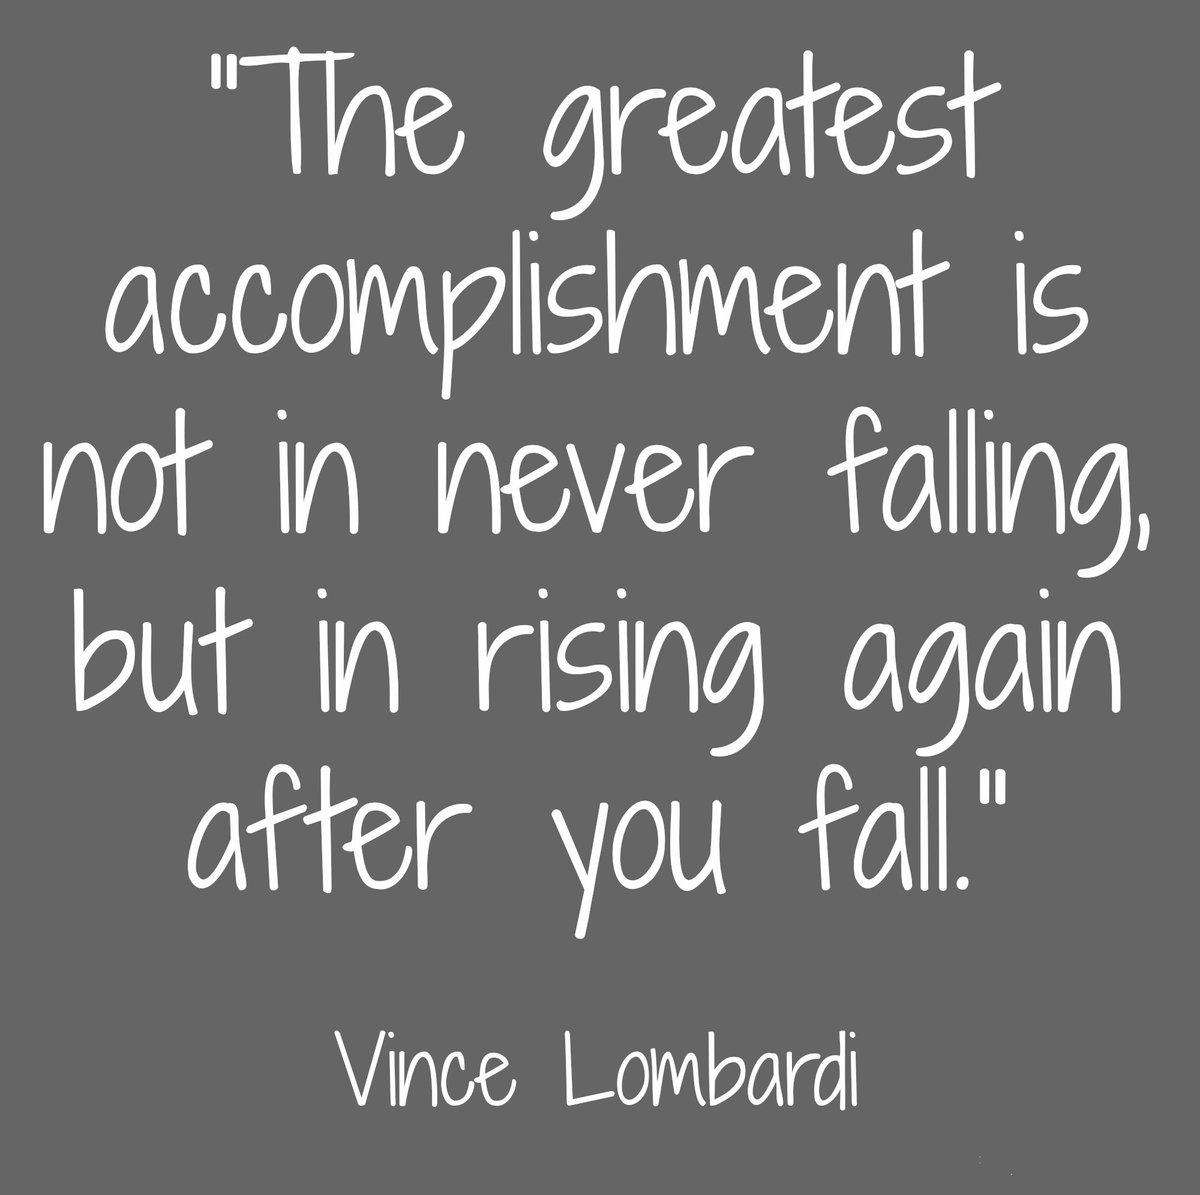 Wisdom Wednesday. #TheWiltWay  | #vincelombardi #WiltClothing #quotes #humpdate<br>http://pic.twitter.com/8fsXga0XHF